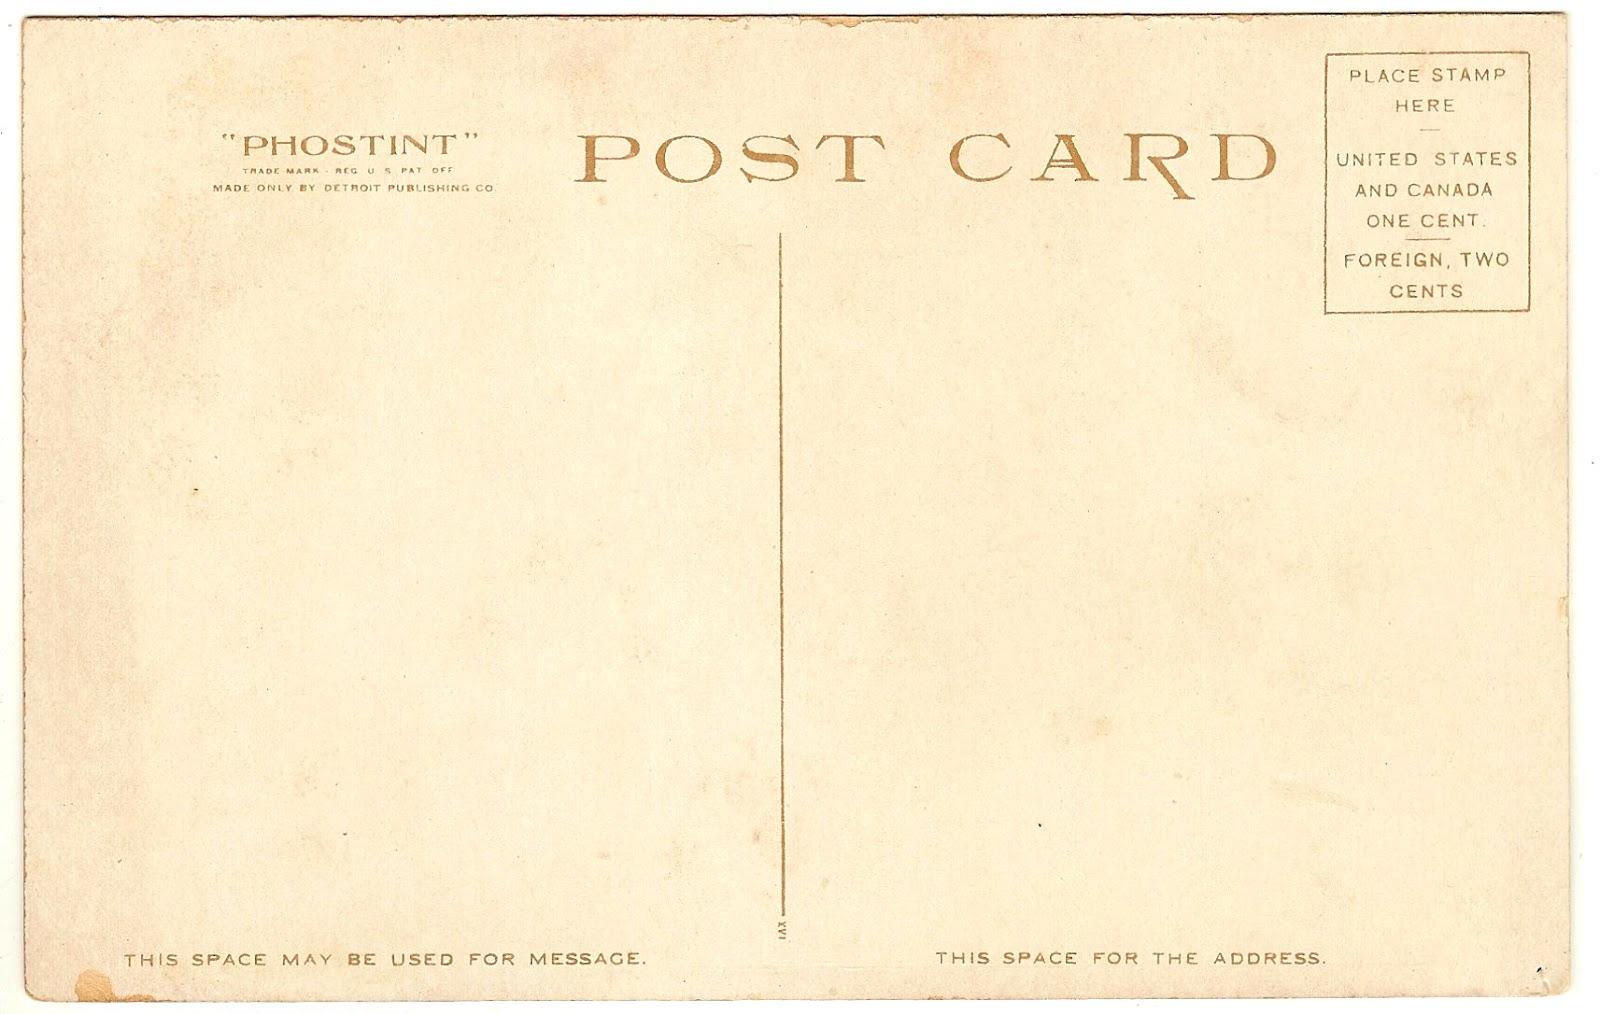 vintage postcards templates - Keni.candlecomfortzone.com